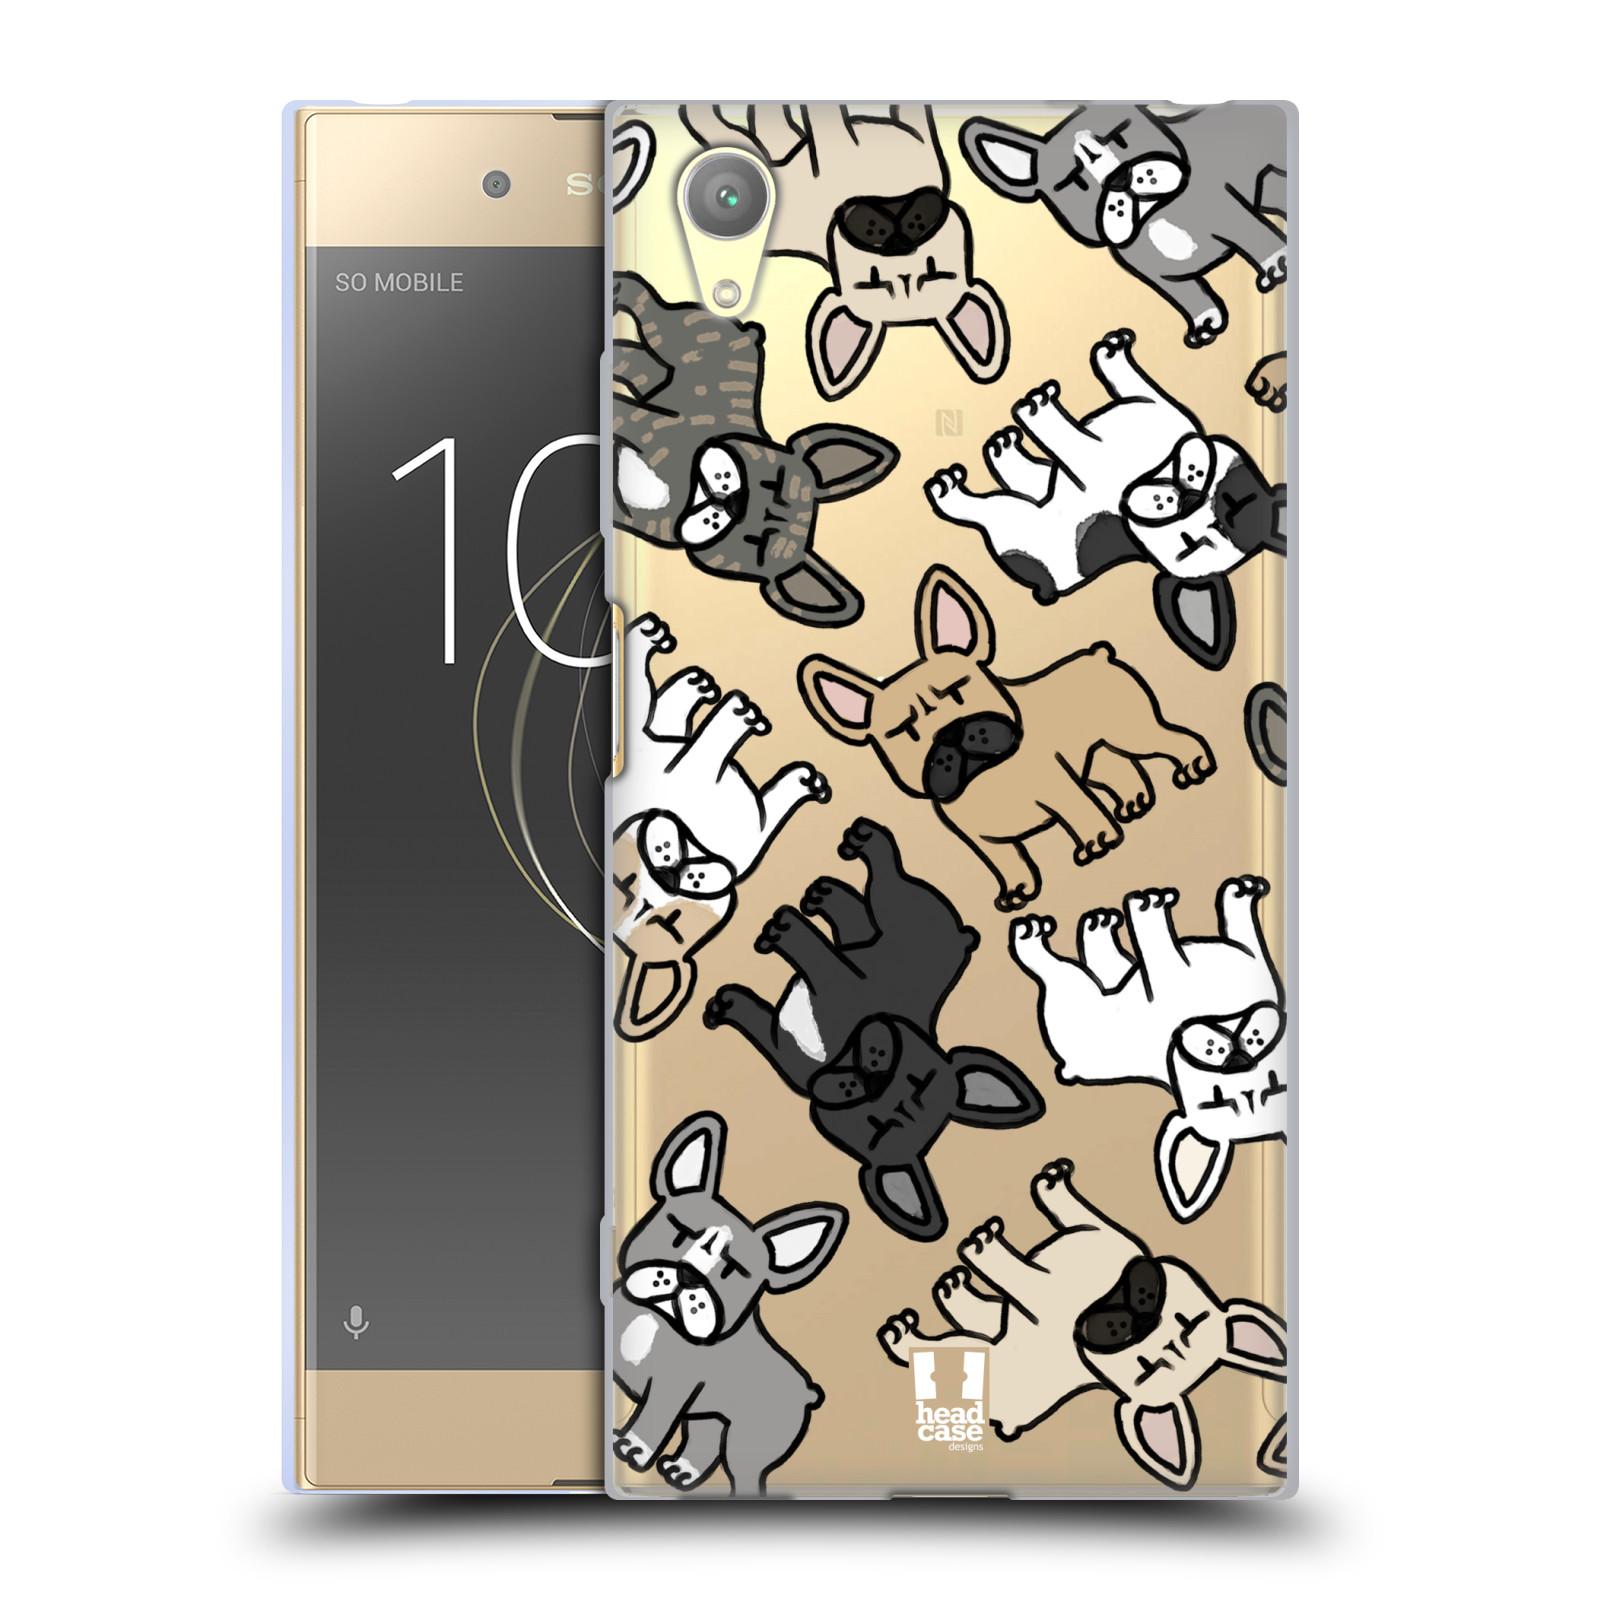 HEAD CASE silikonový obal na mobil Sony Xperia XA1 PLUS pejsek francouzský buldog